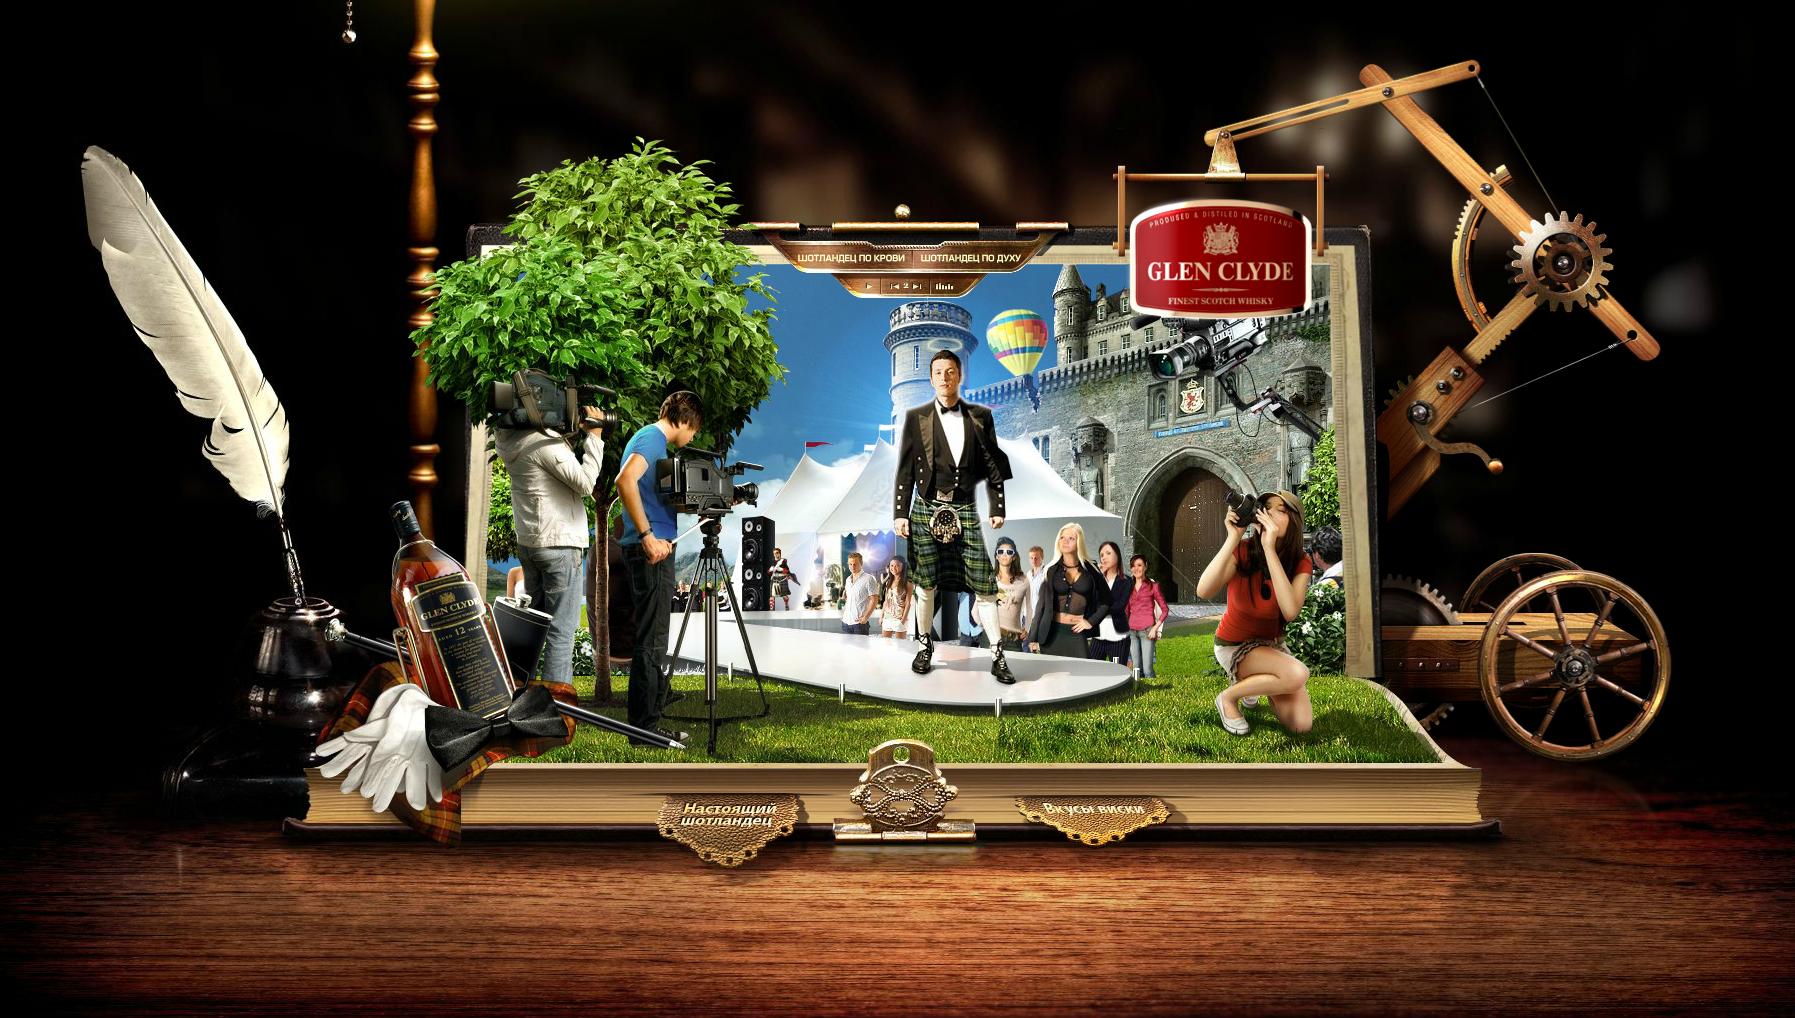 #TopEurope #BestWebAdvertising http://WP.me/p2SWYc-n1 #EuropeanMarketingConsulting